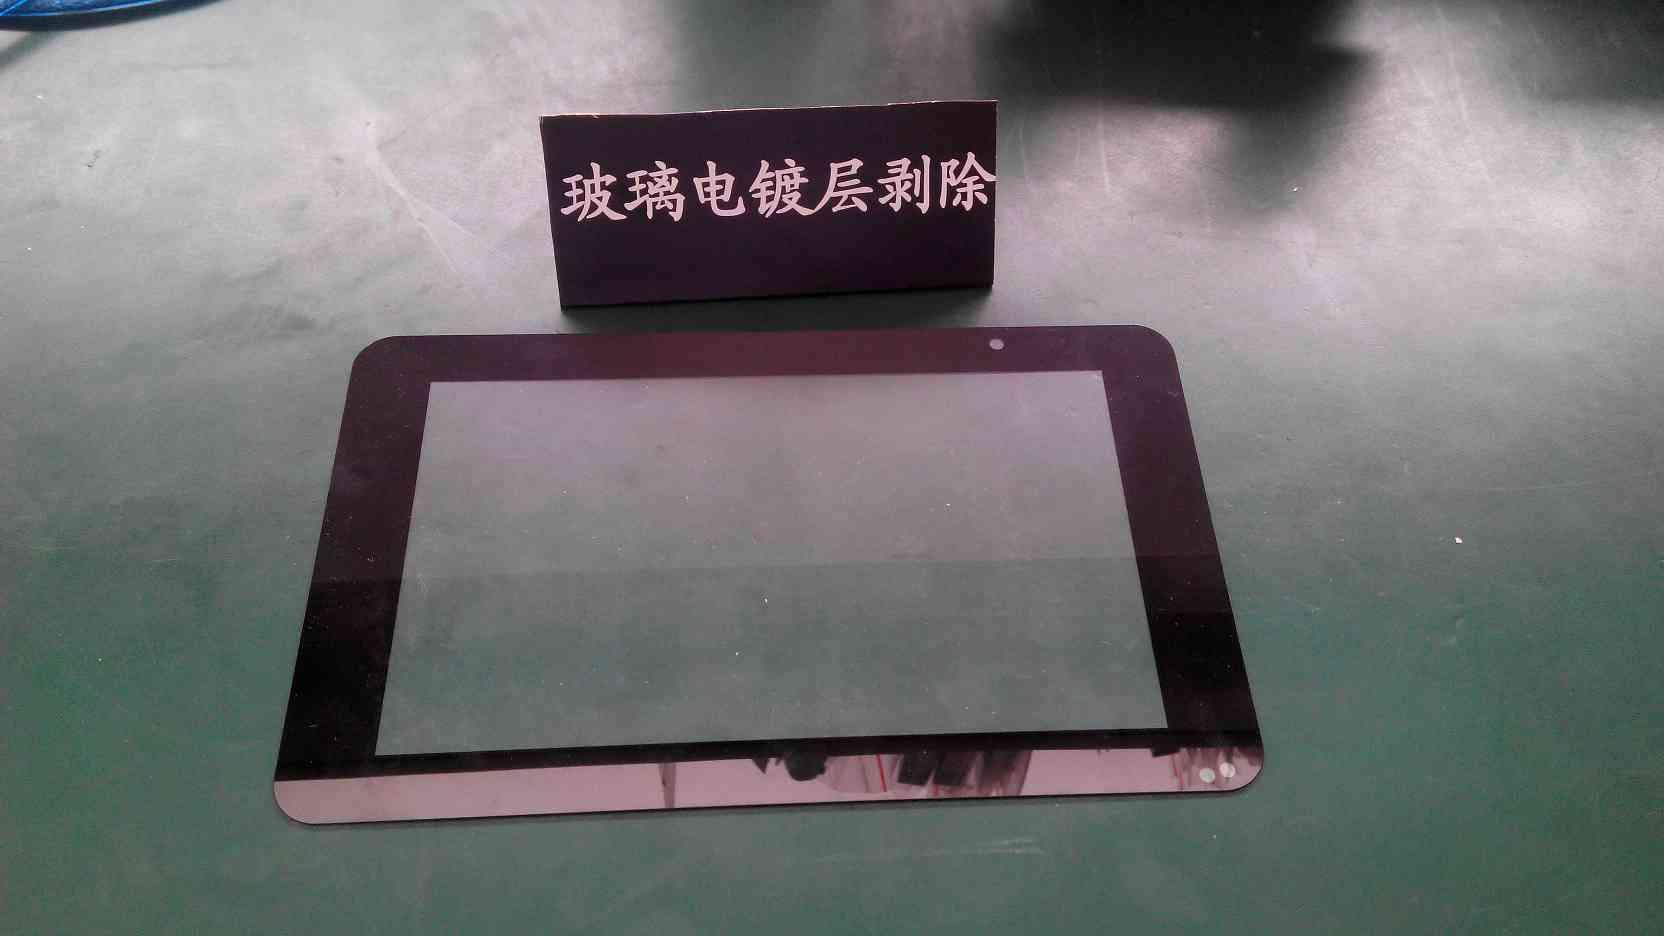 3C电子通讯行业-手机、平板屏幕